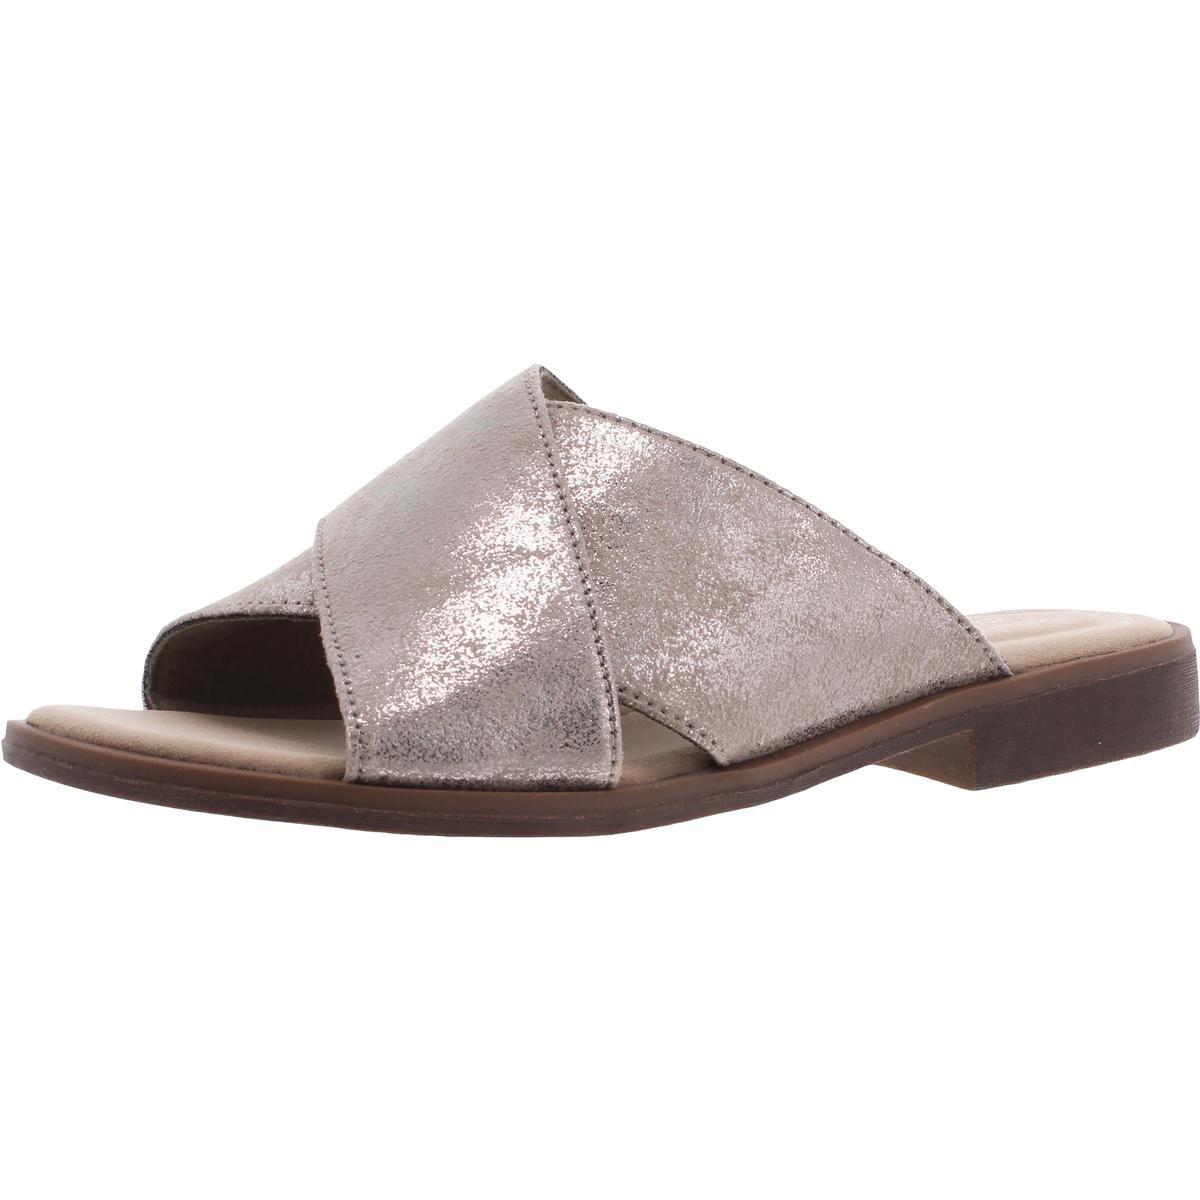 Clarks Womens Slide Sandals Metallic Size 8 Medium (B,M)